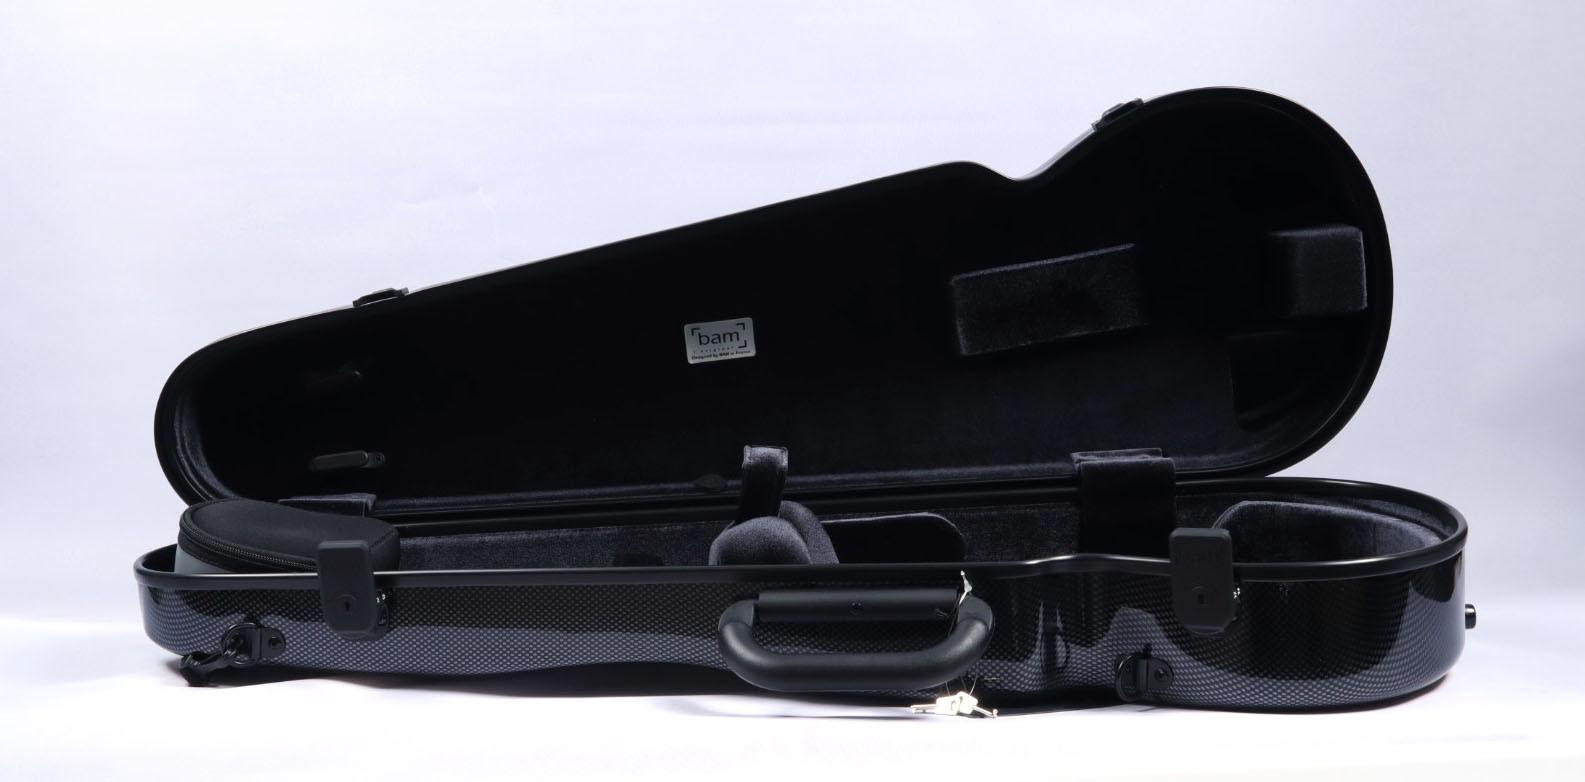 2002XLC - Hightech Contoured Violin Case - Black Carbon Look